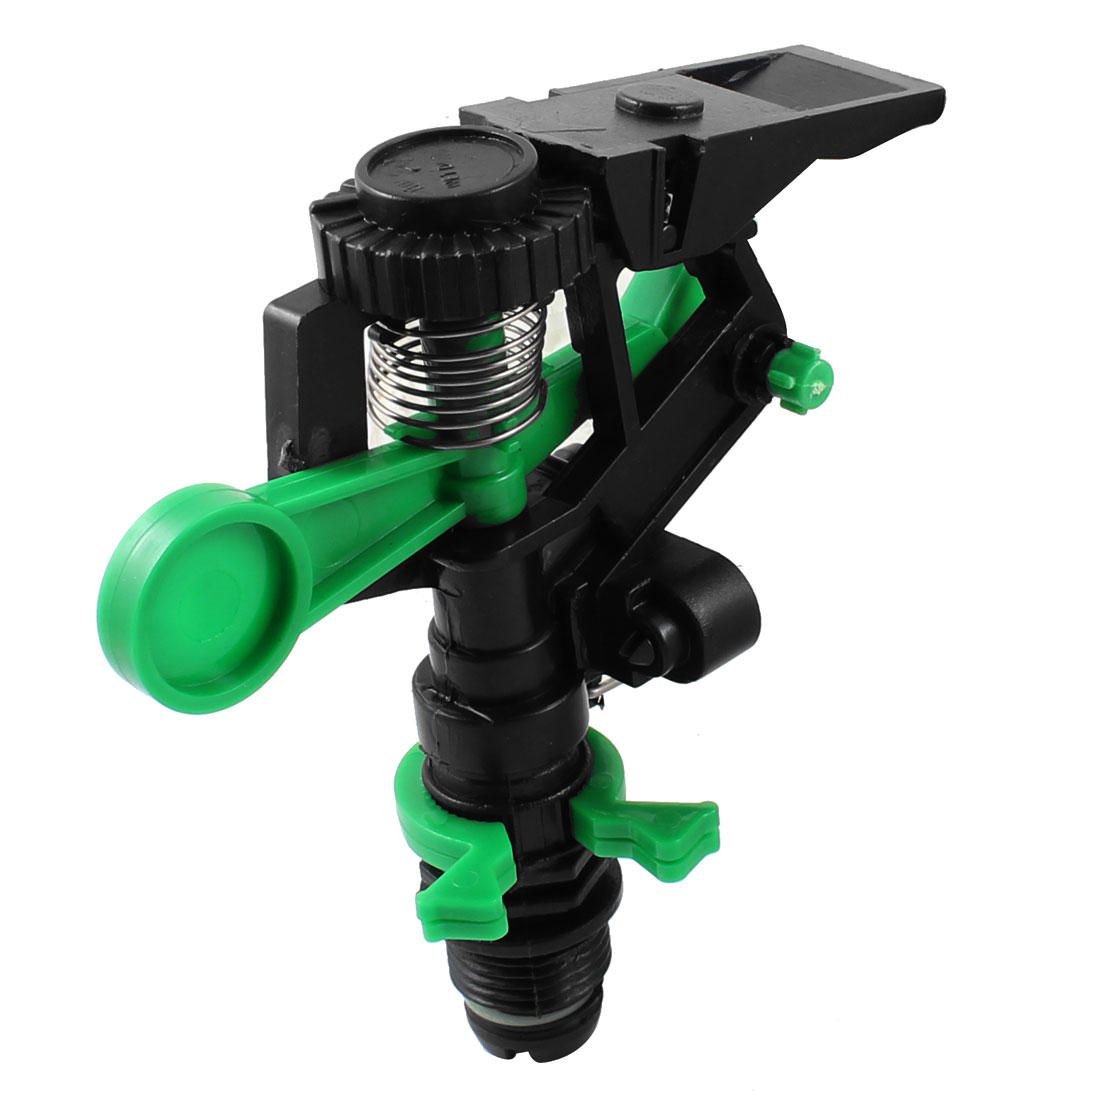 Agriculture Plant Adjustable Irrigation Plastic Sprayer Nozzle Black Green